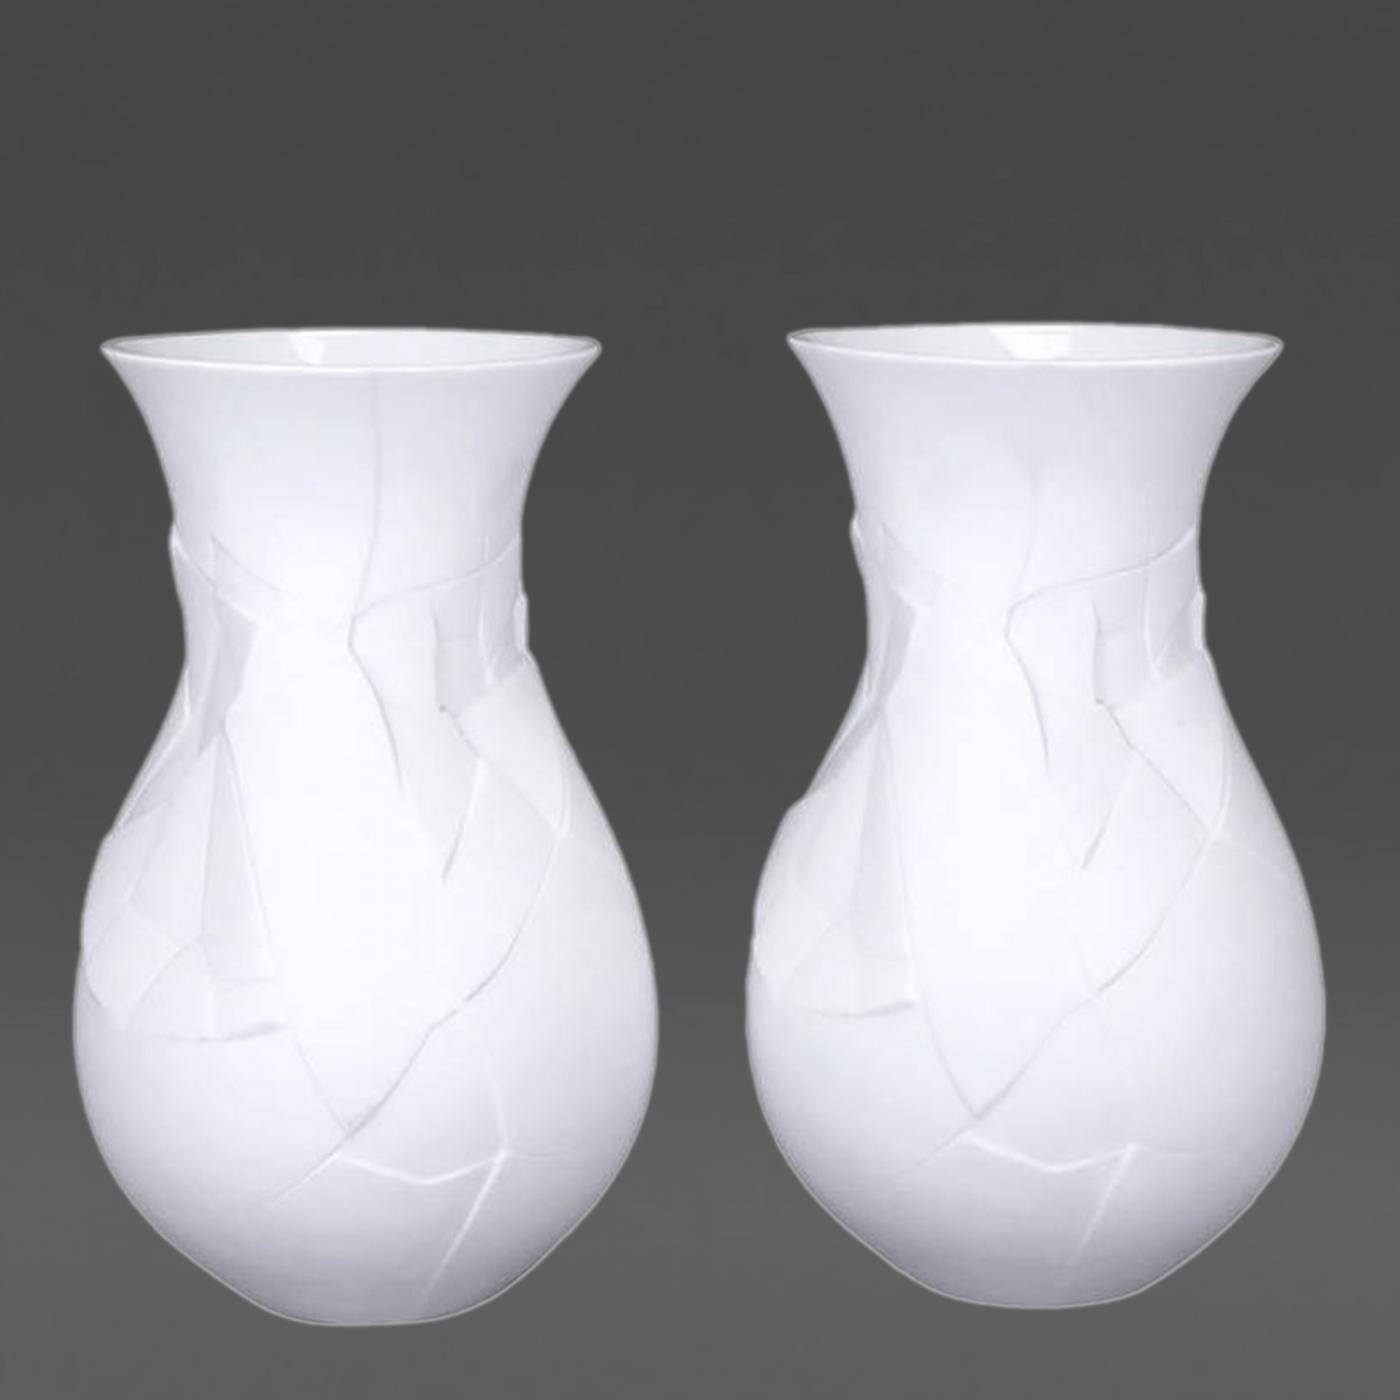 dror benshetrit  pair of rosenthal studio line mattewhite vases  - listings  decorative arts  decorative objects  vases jars  urns